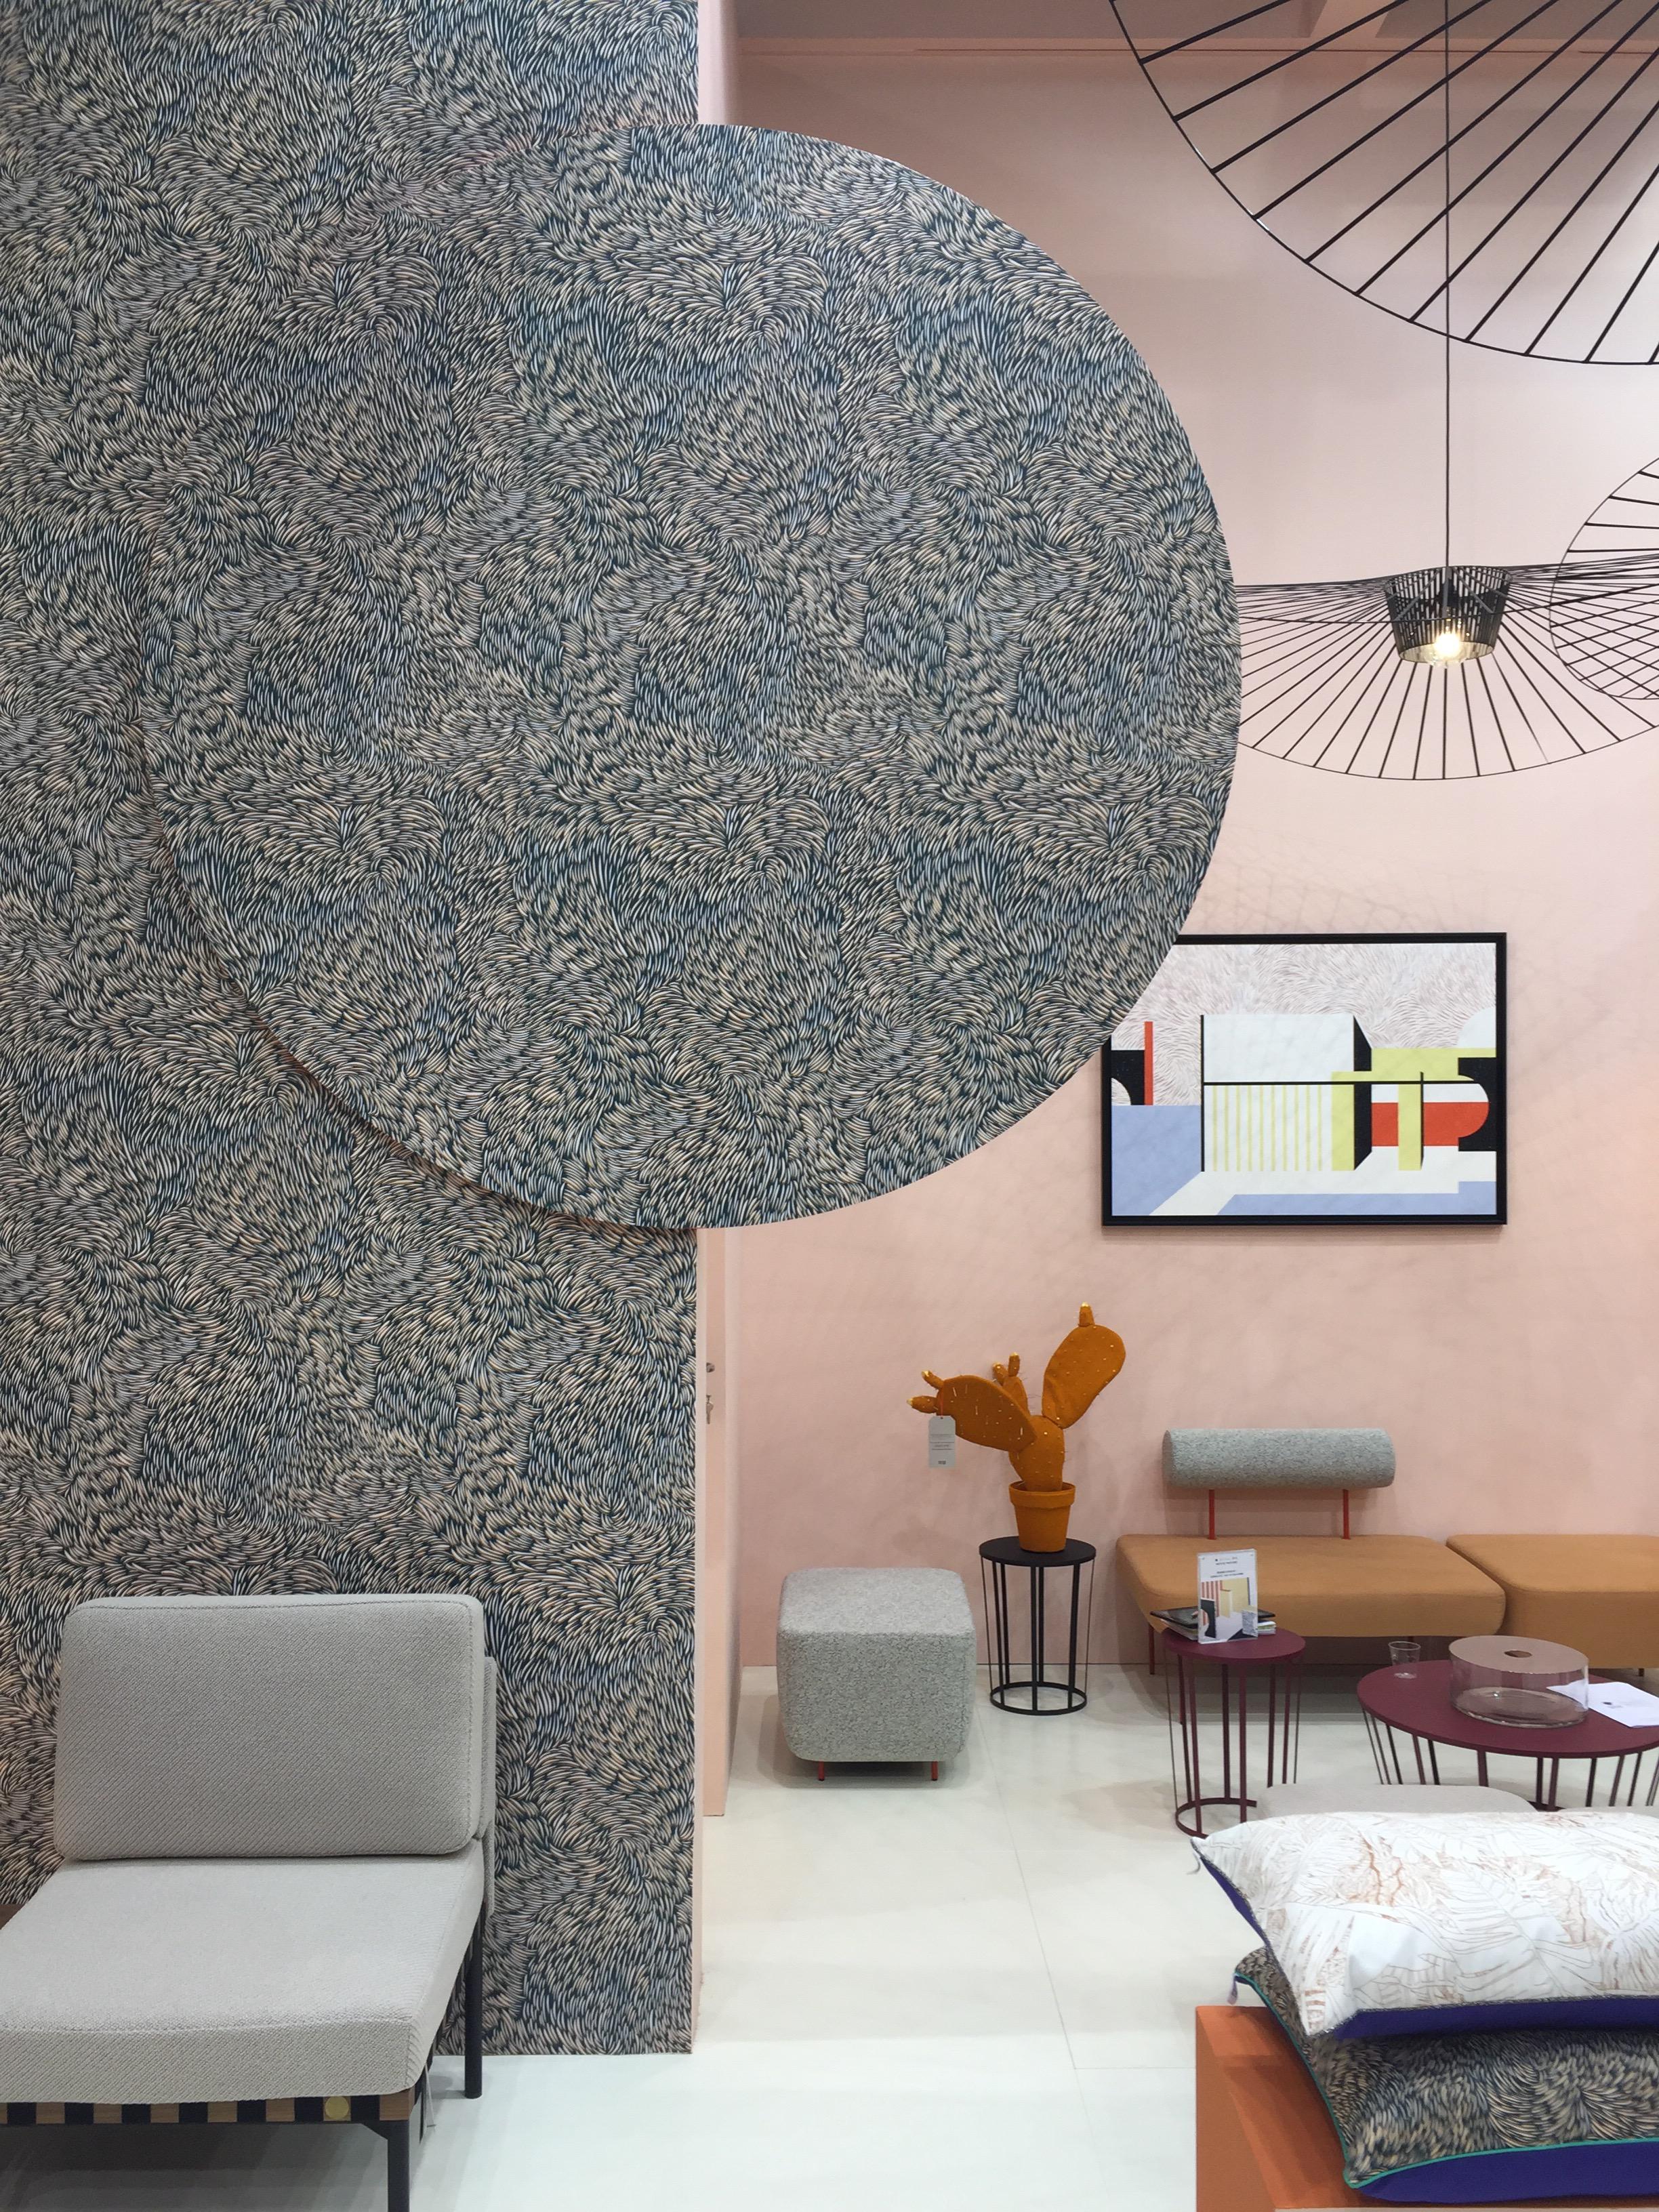 #dehotelpartners #designweek #inspiration #interiordesign #milano #petitefriture